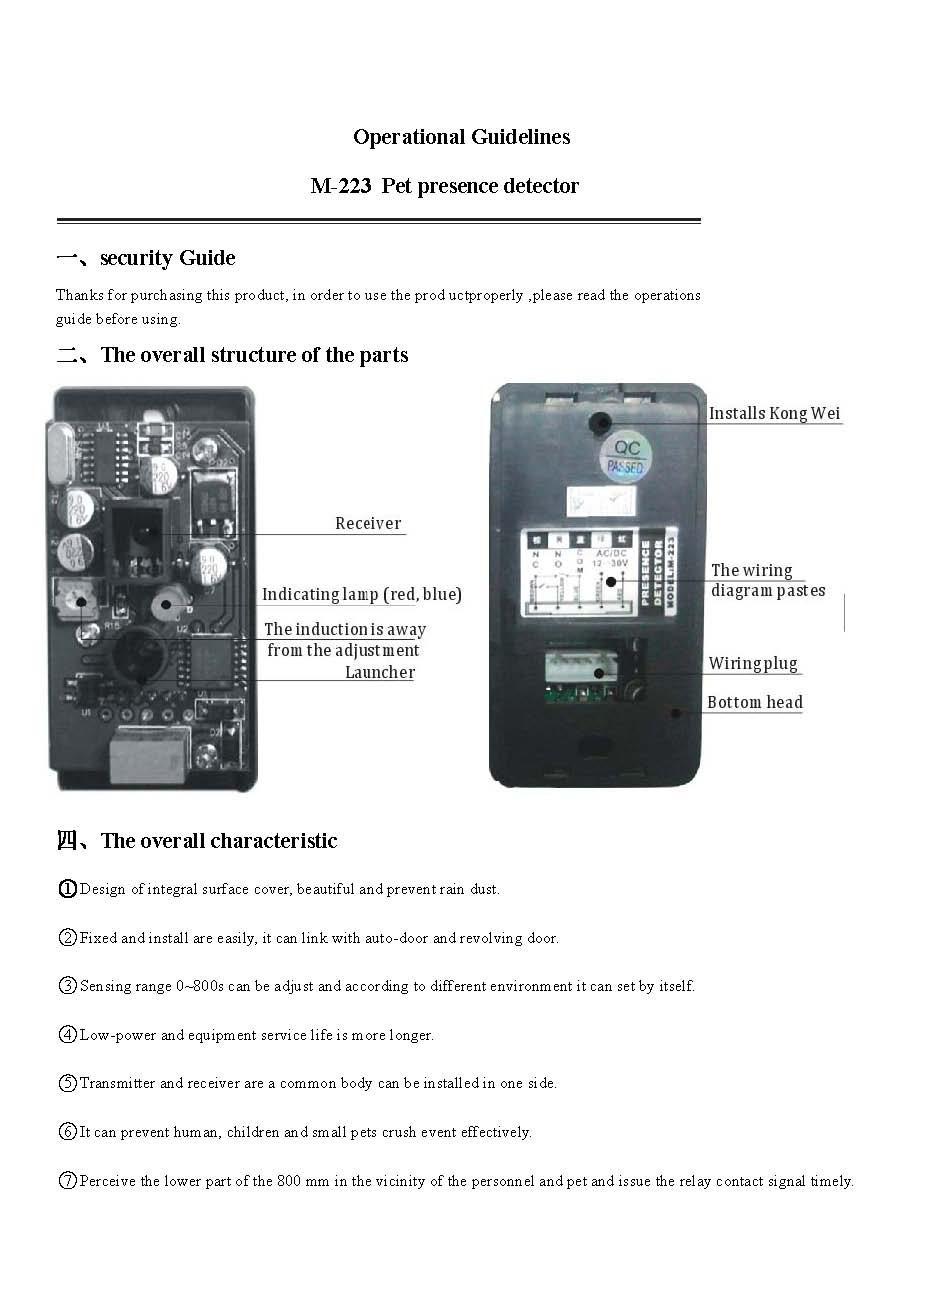 M-223 Pet presence detector_.._1